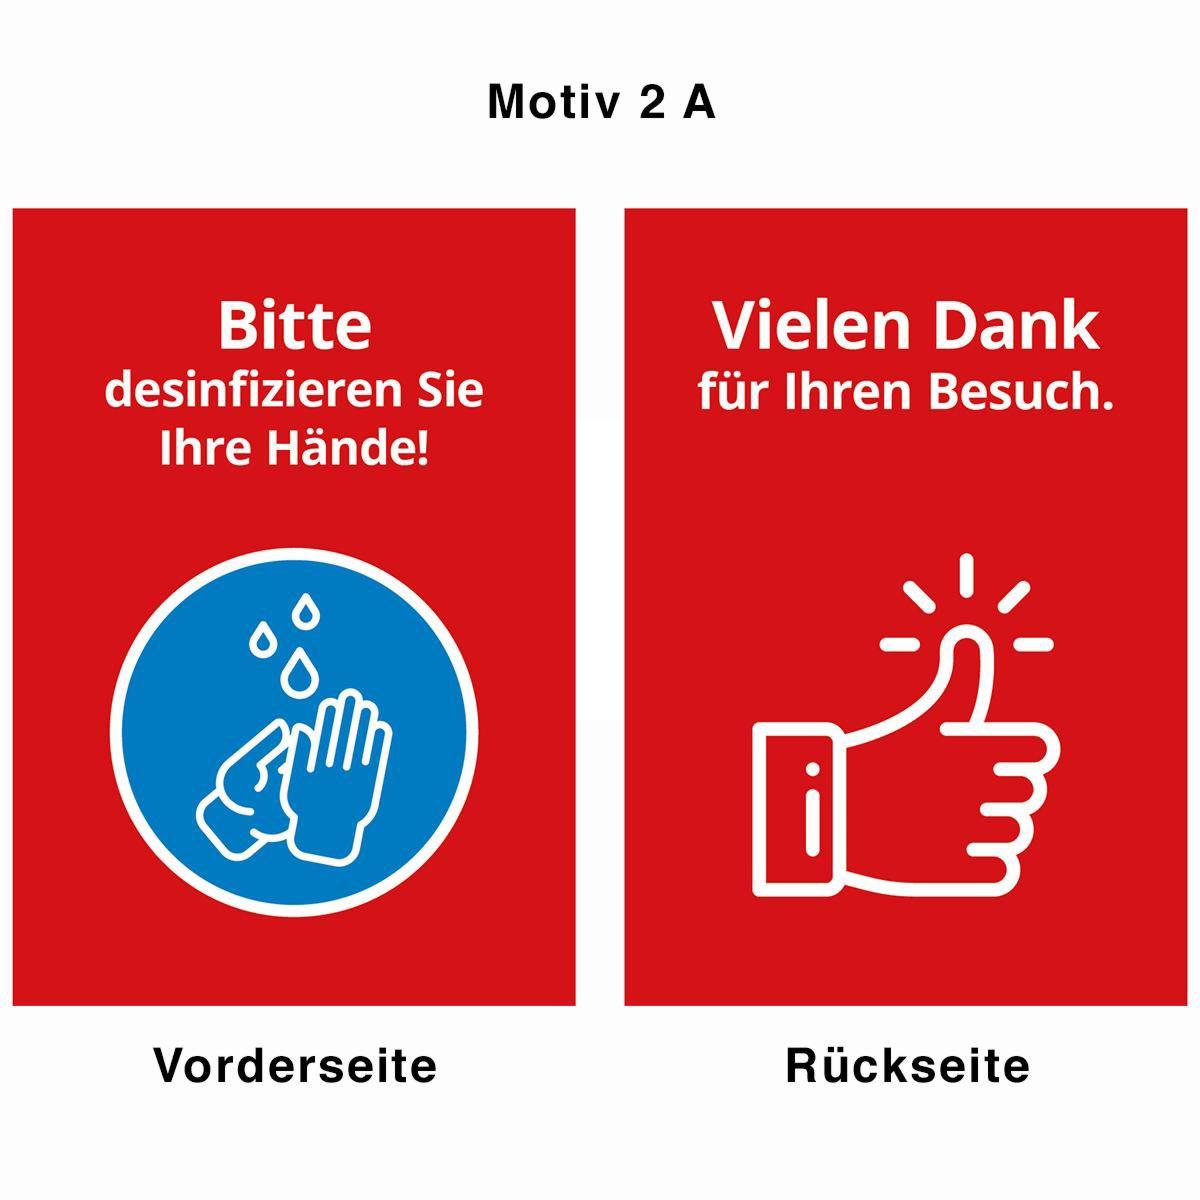 Desinfektionsständer - Motiv 2 A